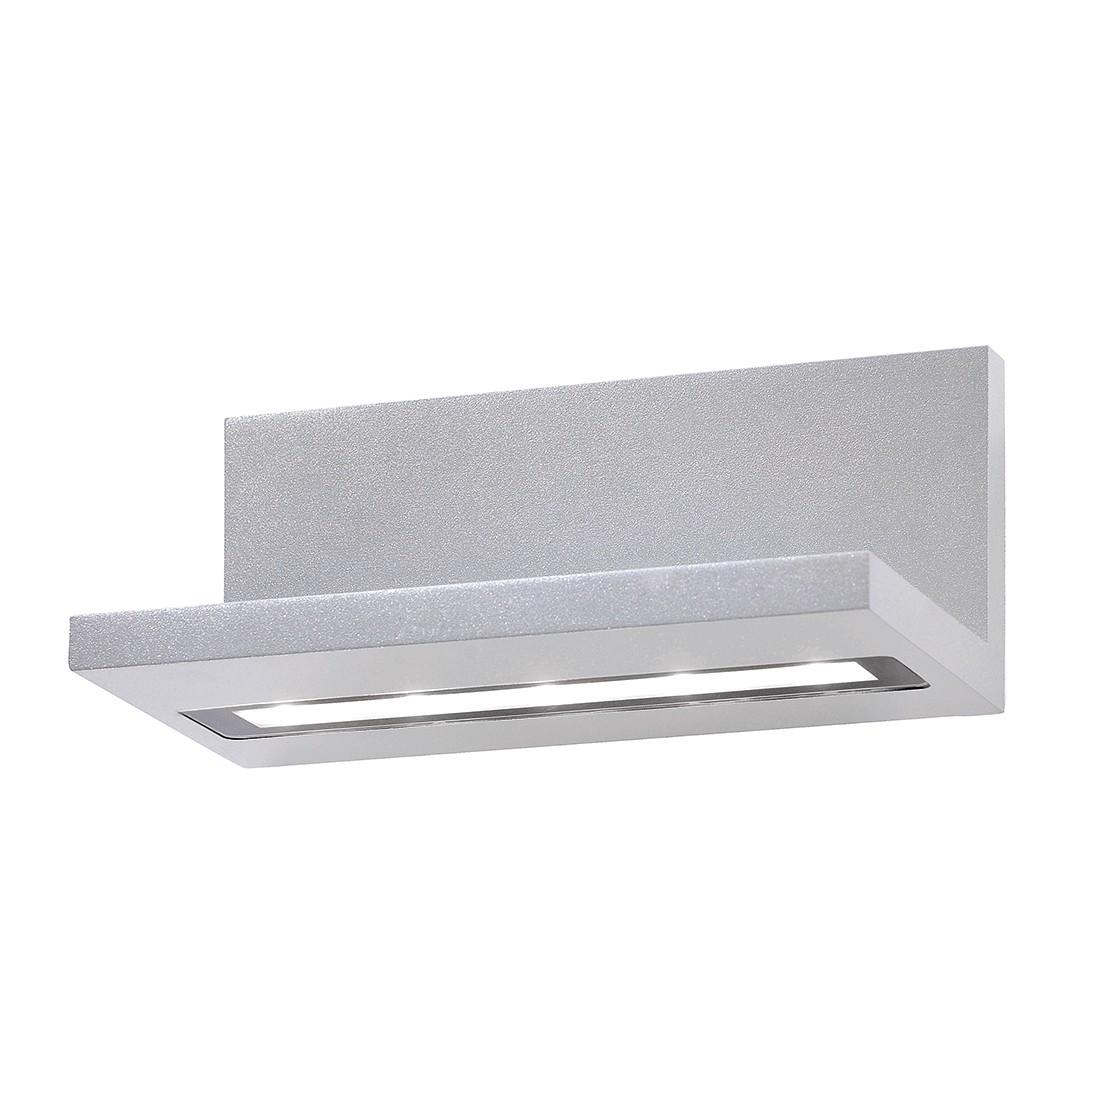 Wandleuchte Lindow – Aluminium – 1-flammig, FLI Leuchten jetzt kaufen